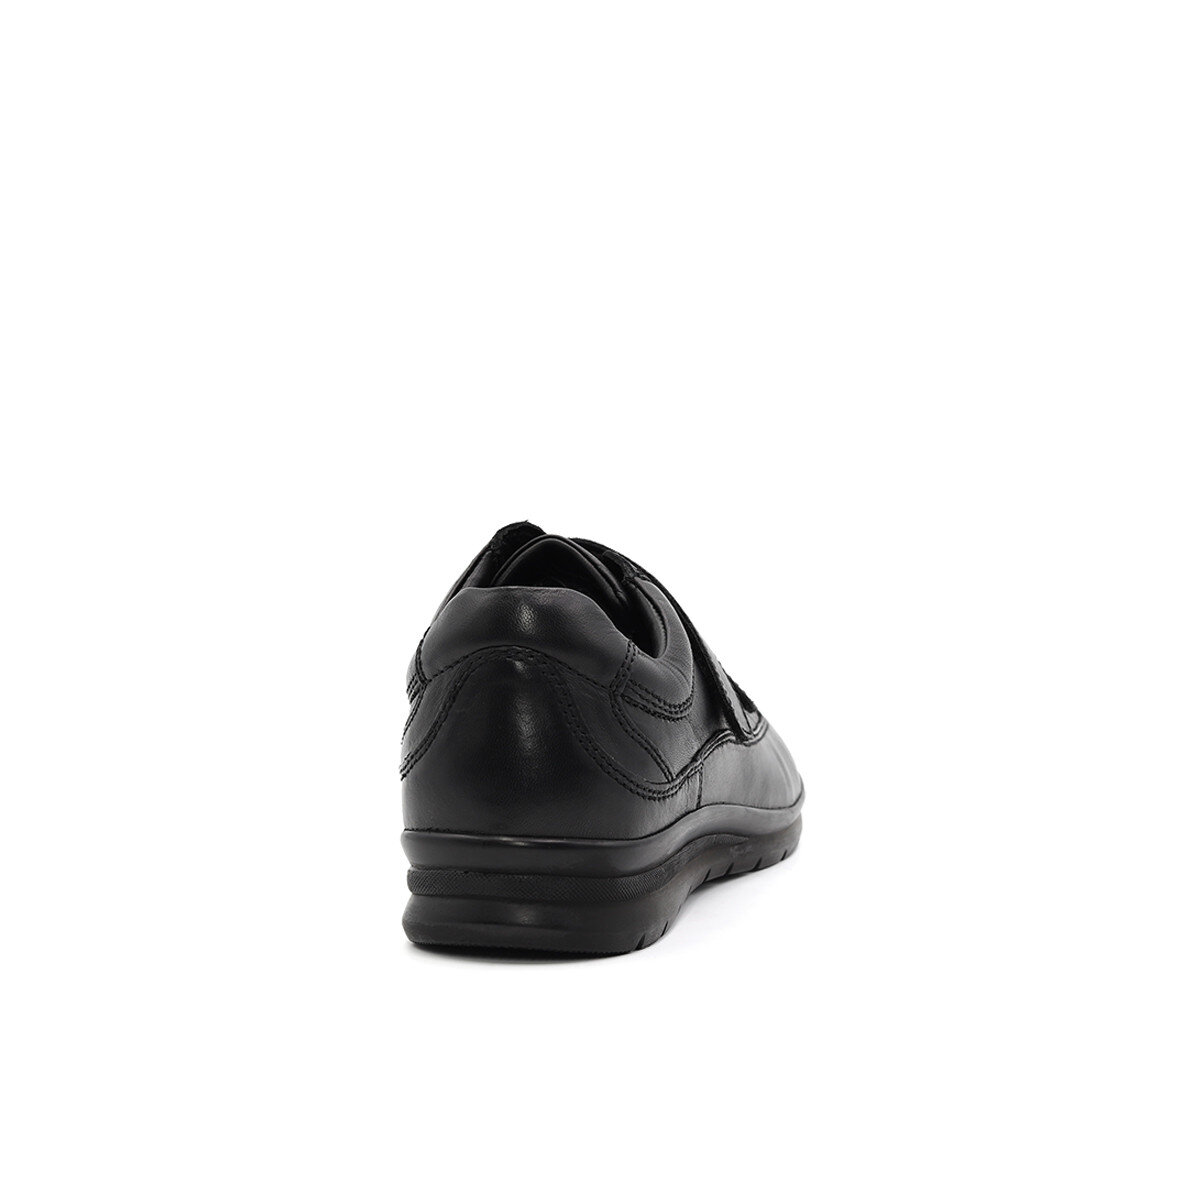 SERRA Casual shoes Man